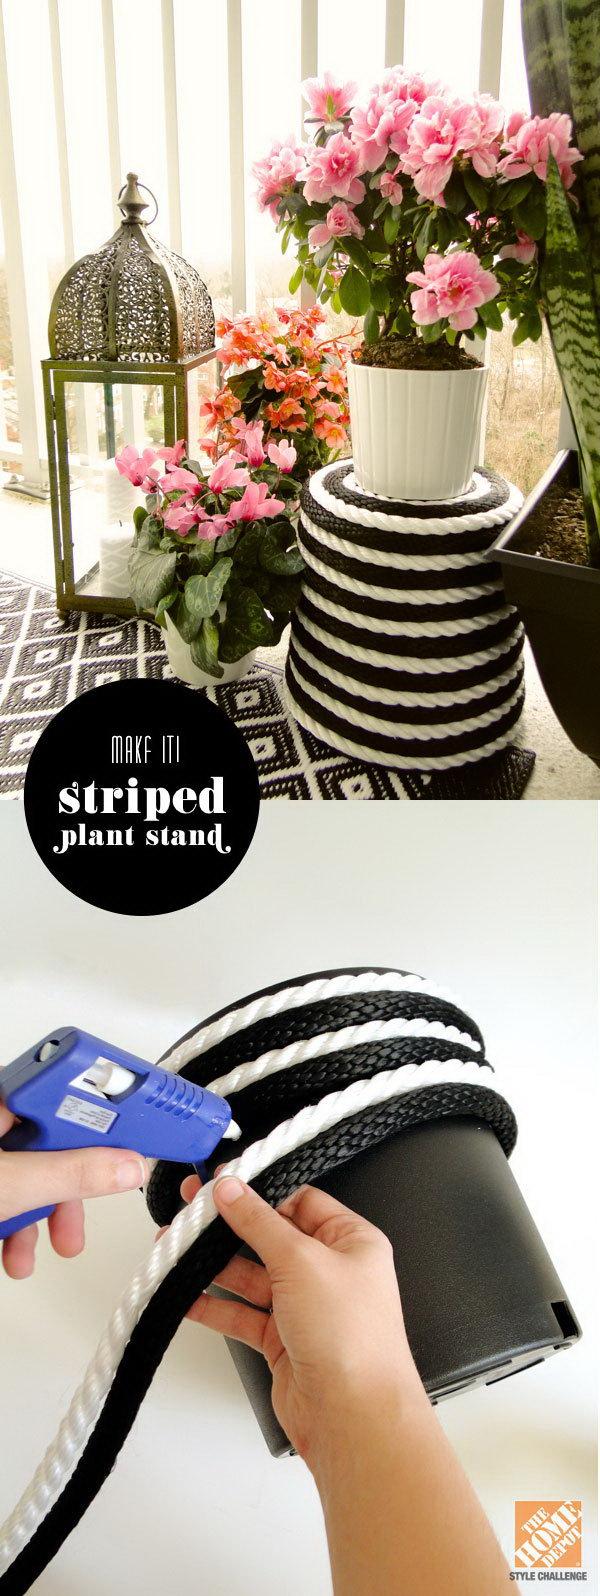 17 rope crafts - 25 DIY Rope Craft Ideas